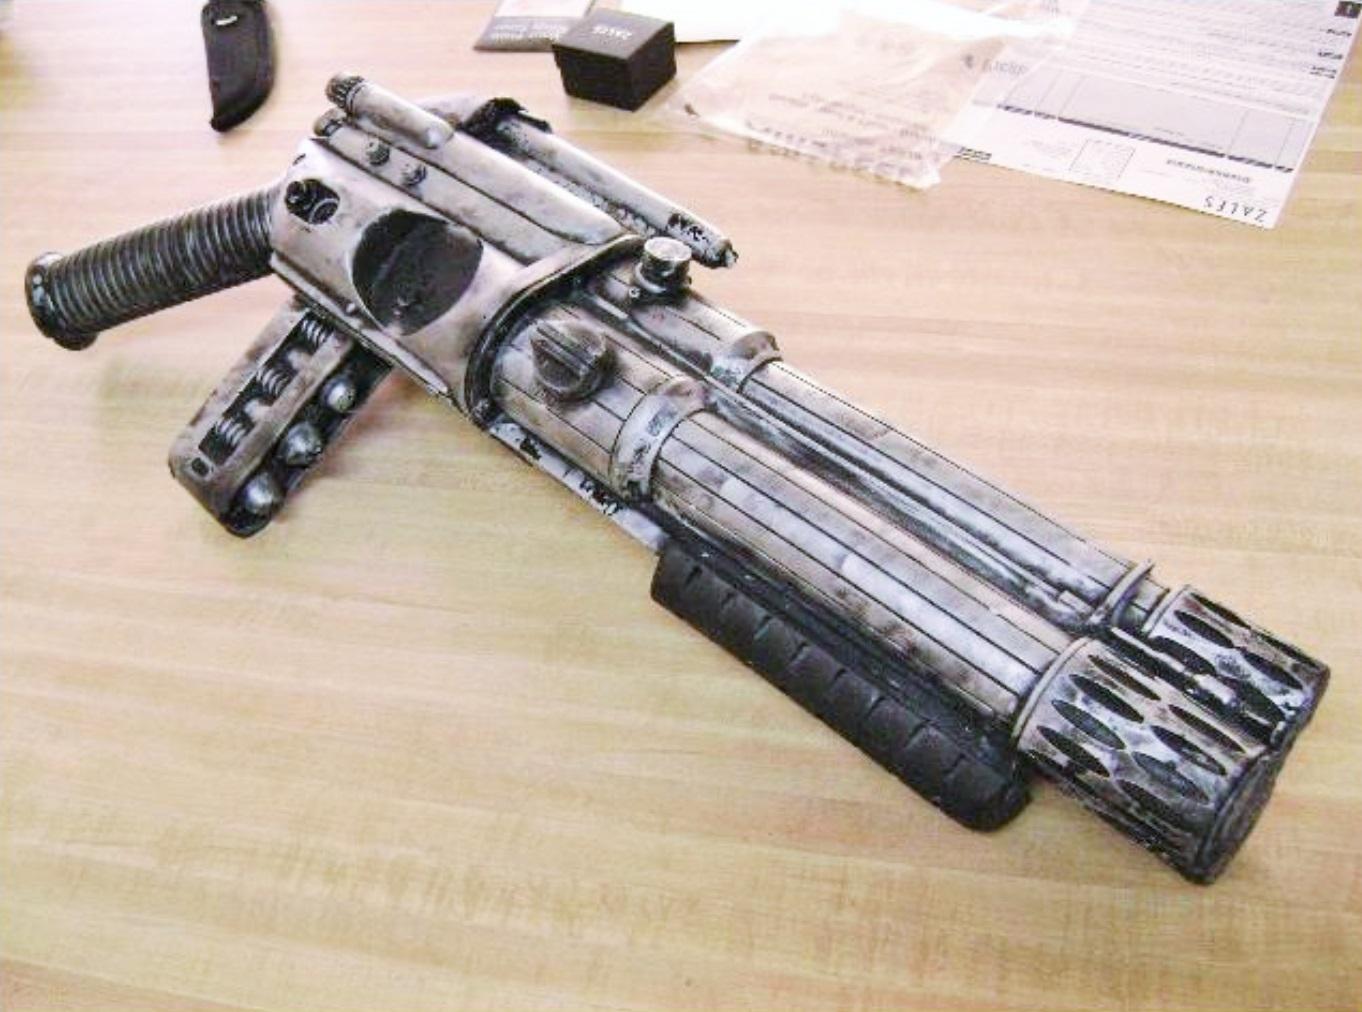 MIB_Arquellian Arm Cannon-Real Prop (9).jpg